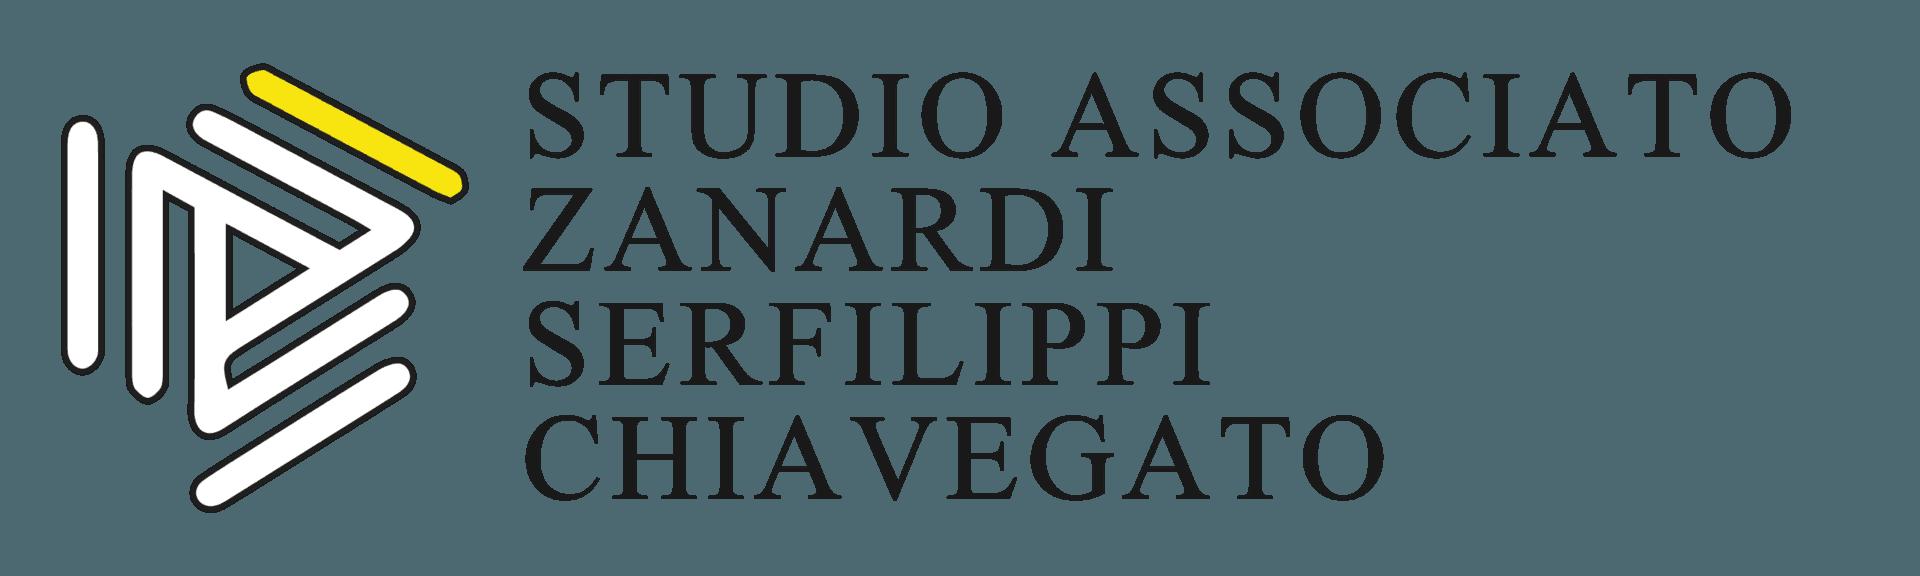 studio associato Zanardi Serfilippi Chiavegato